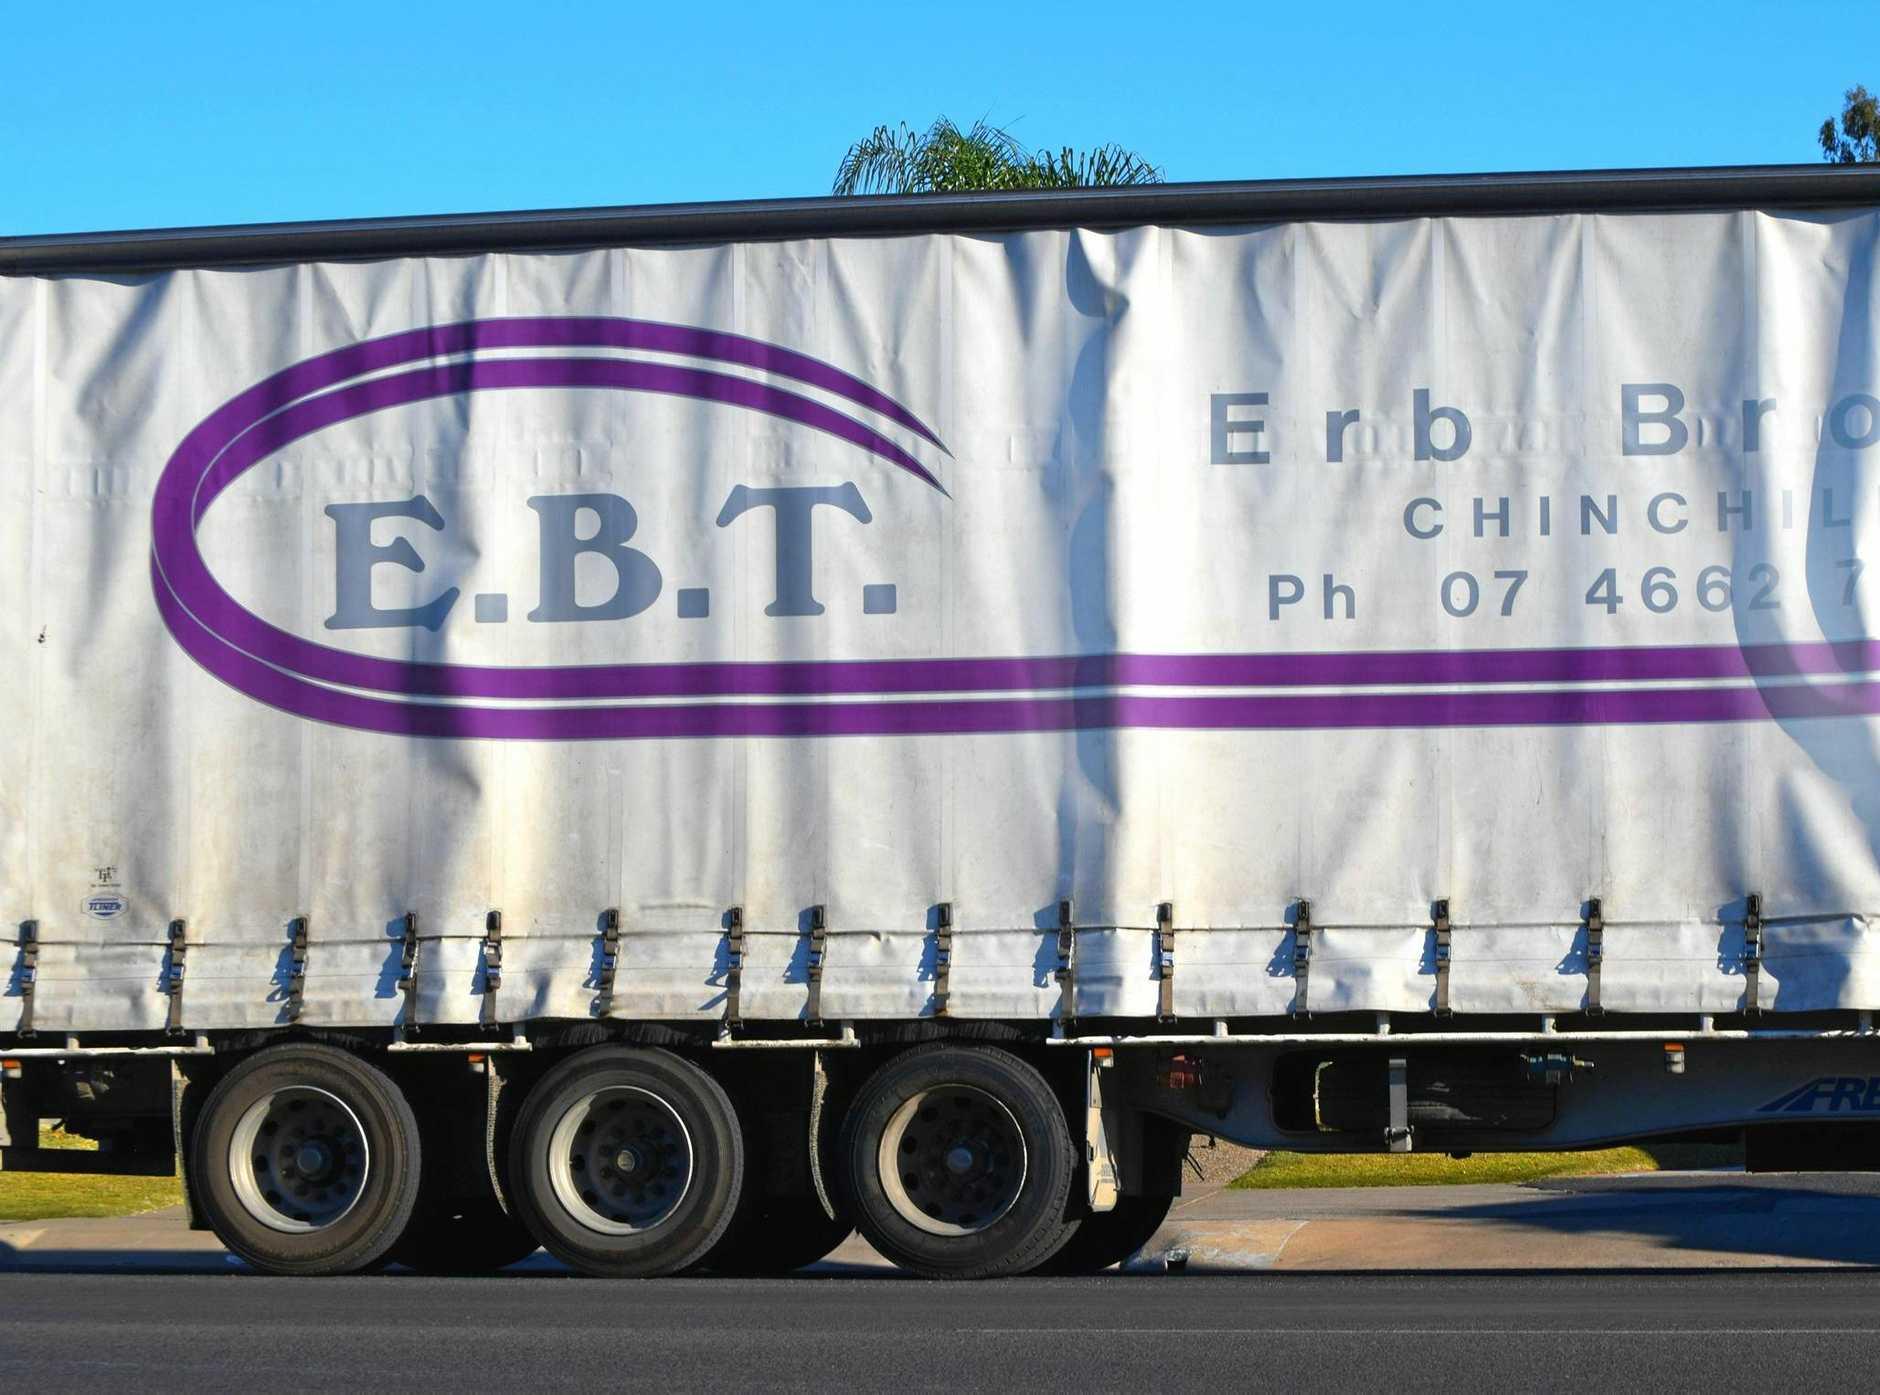 IN LIQUIDATION: Erb Brother's Transport truck seen in Chinchilla.